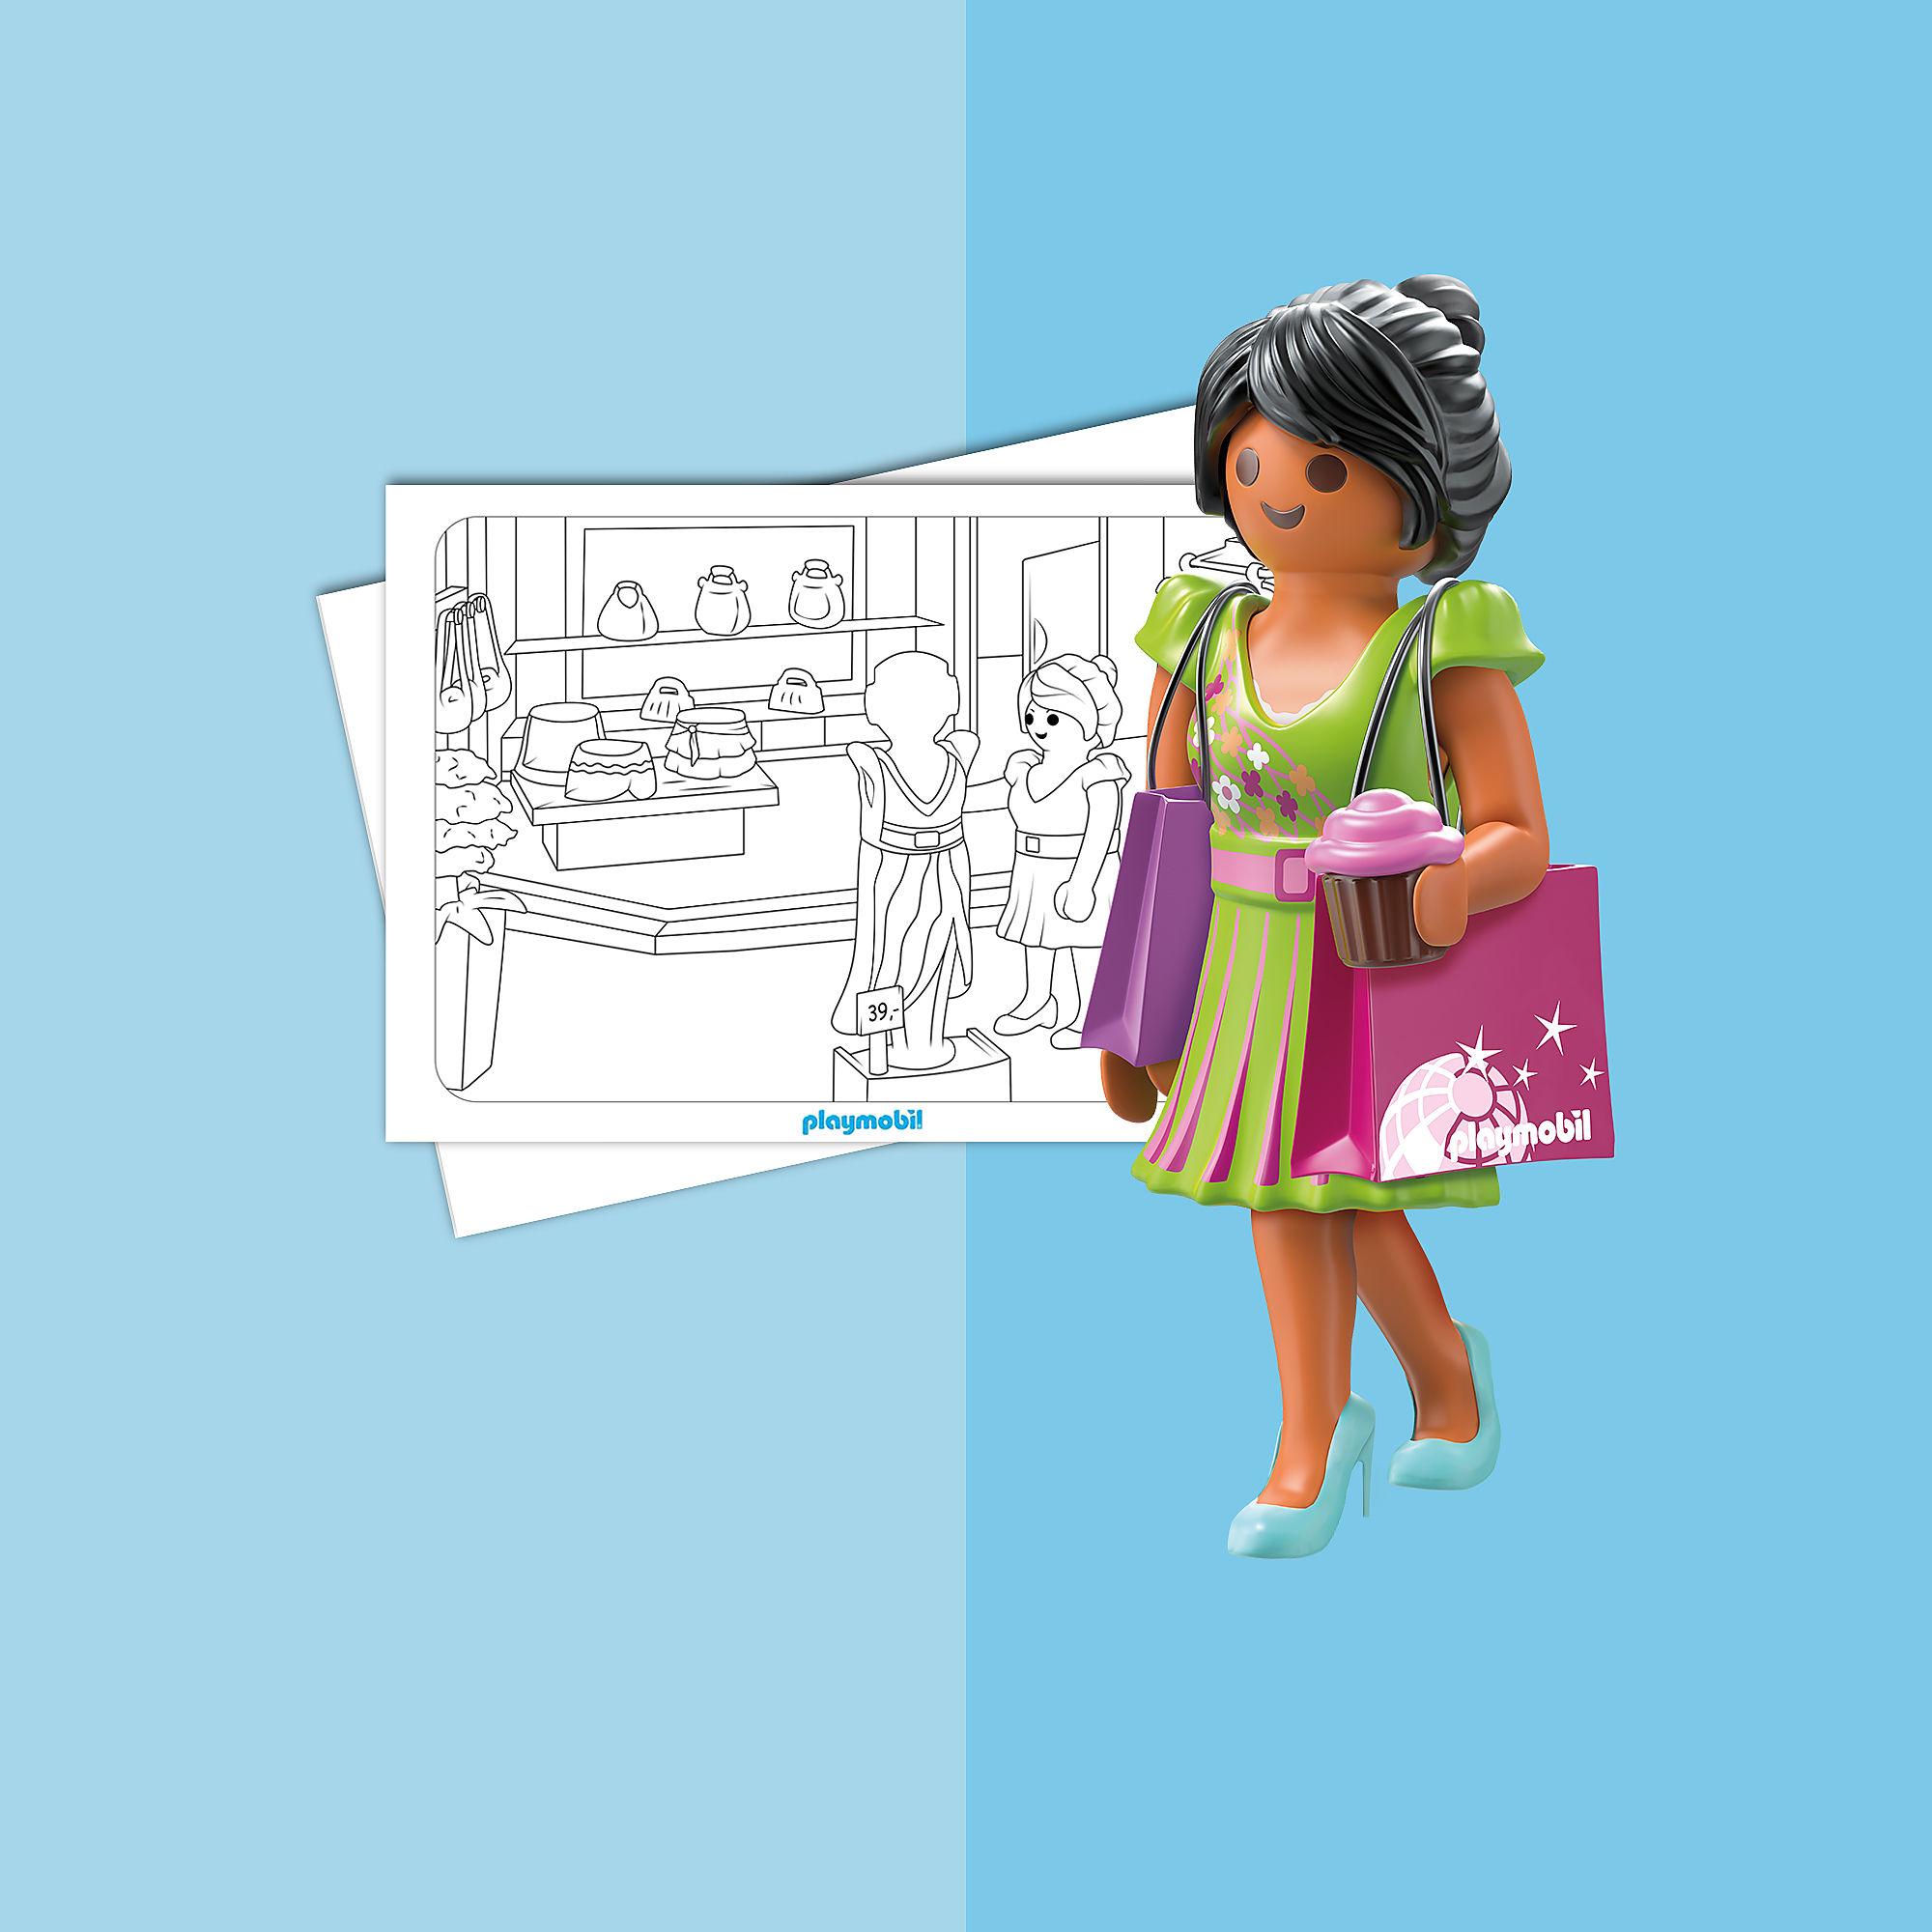 colouring sheet  playmobil shopping